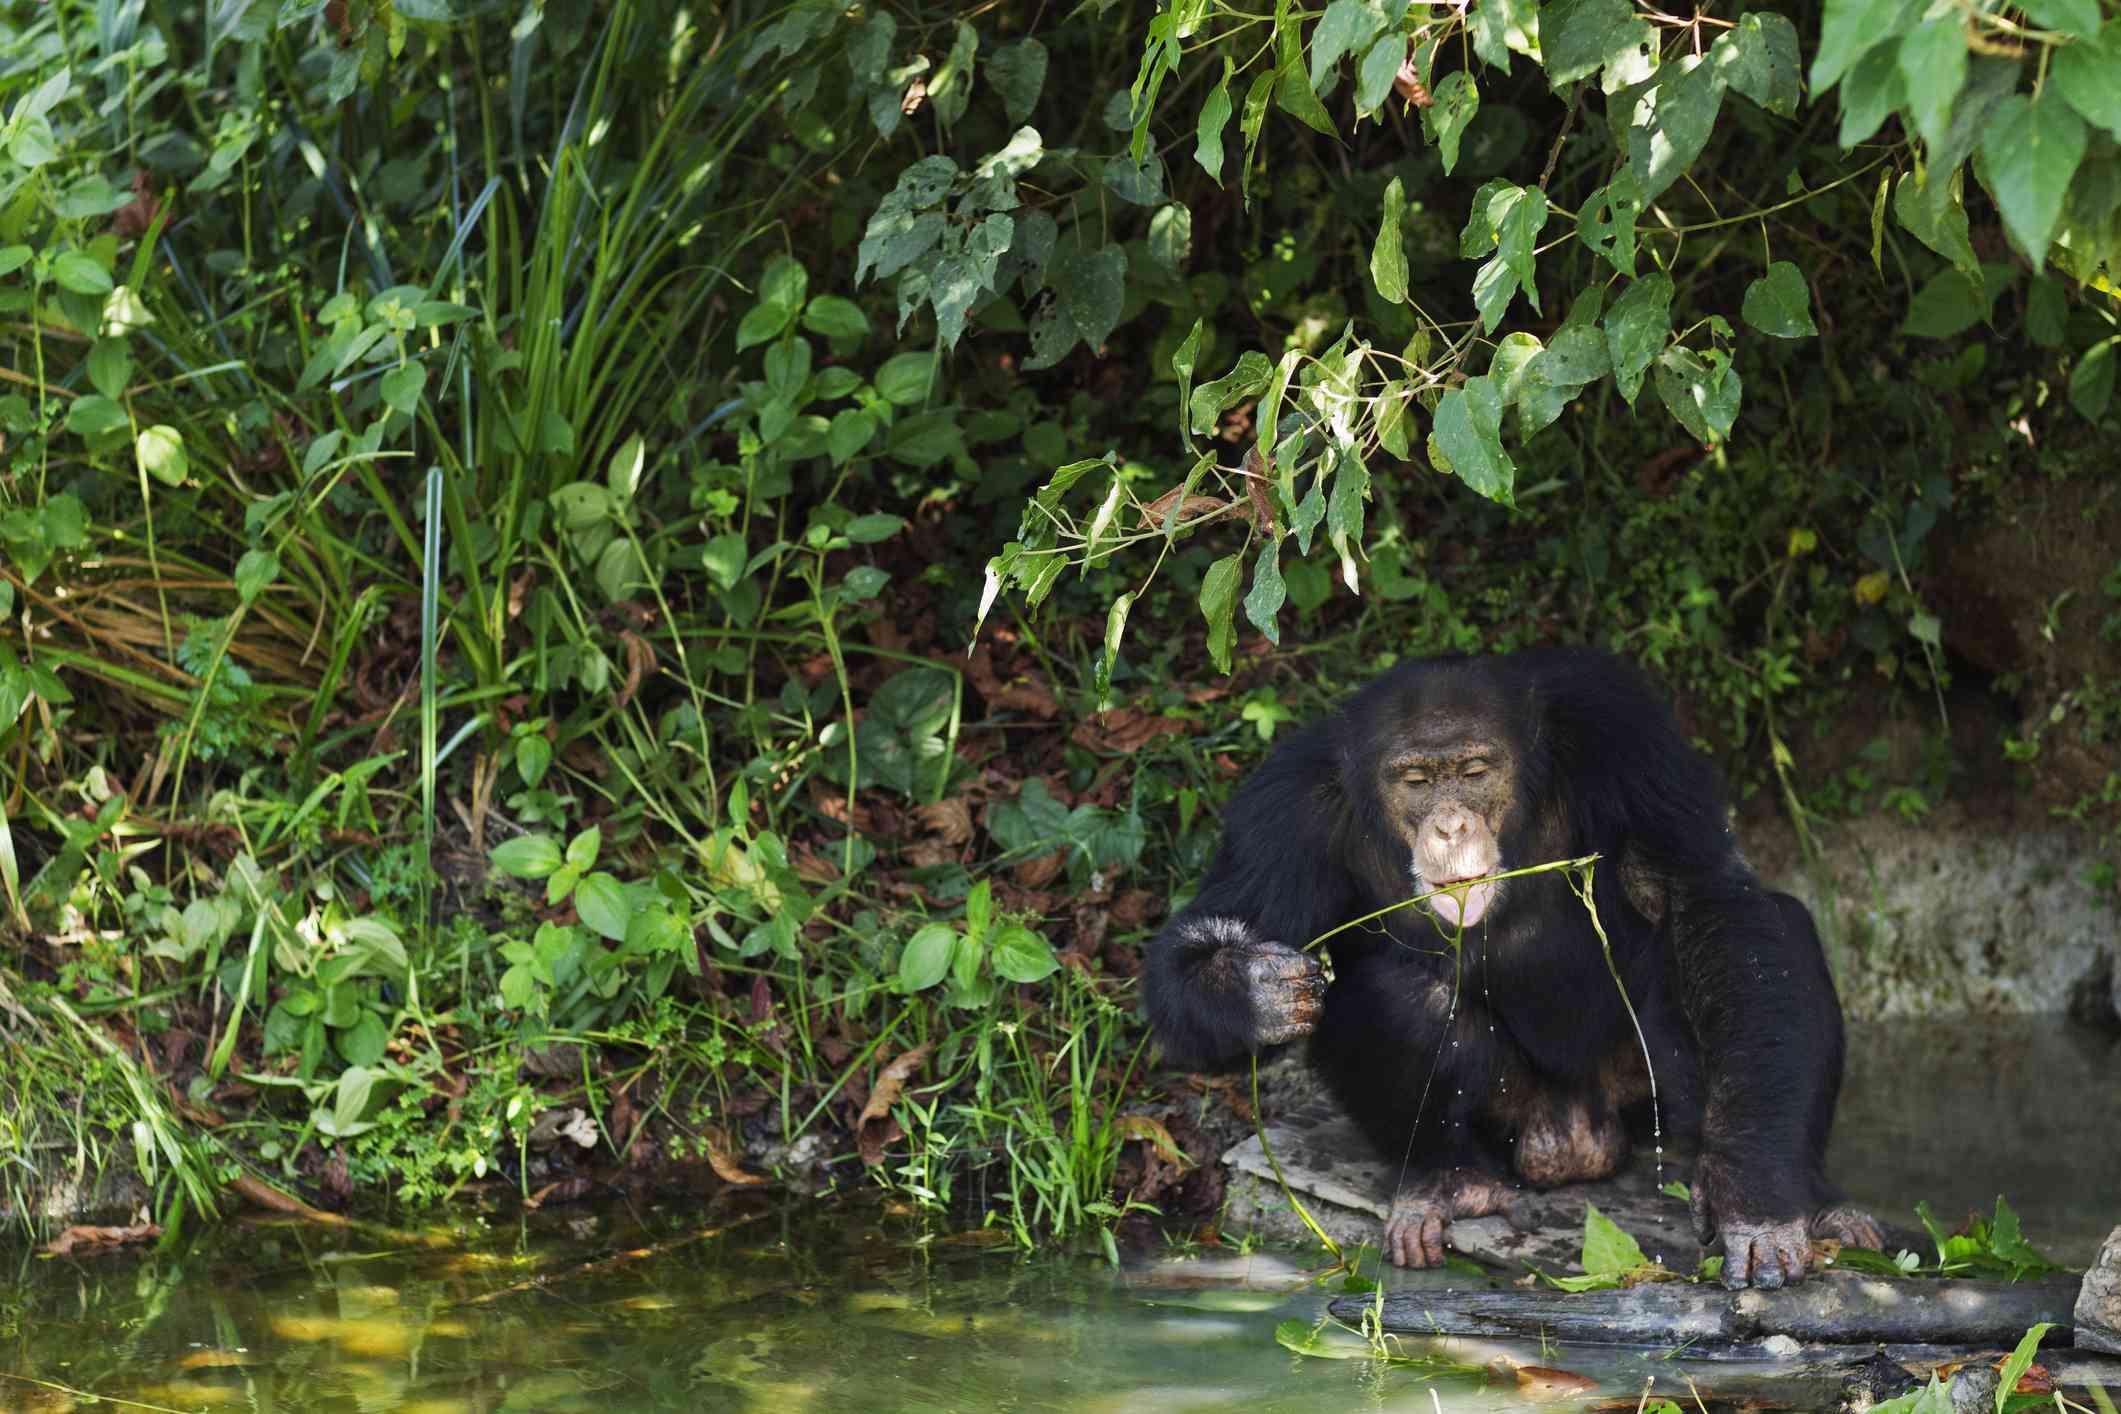 Western chimpanzee male using a tool